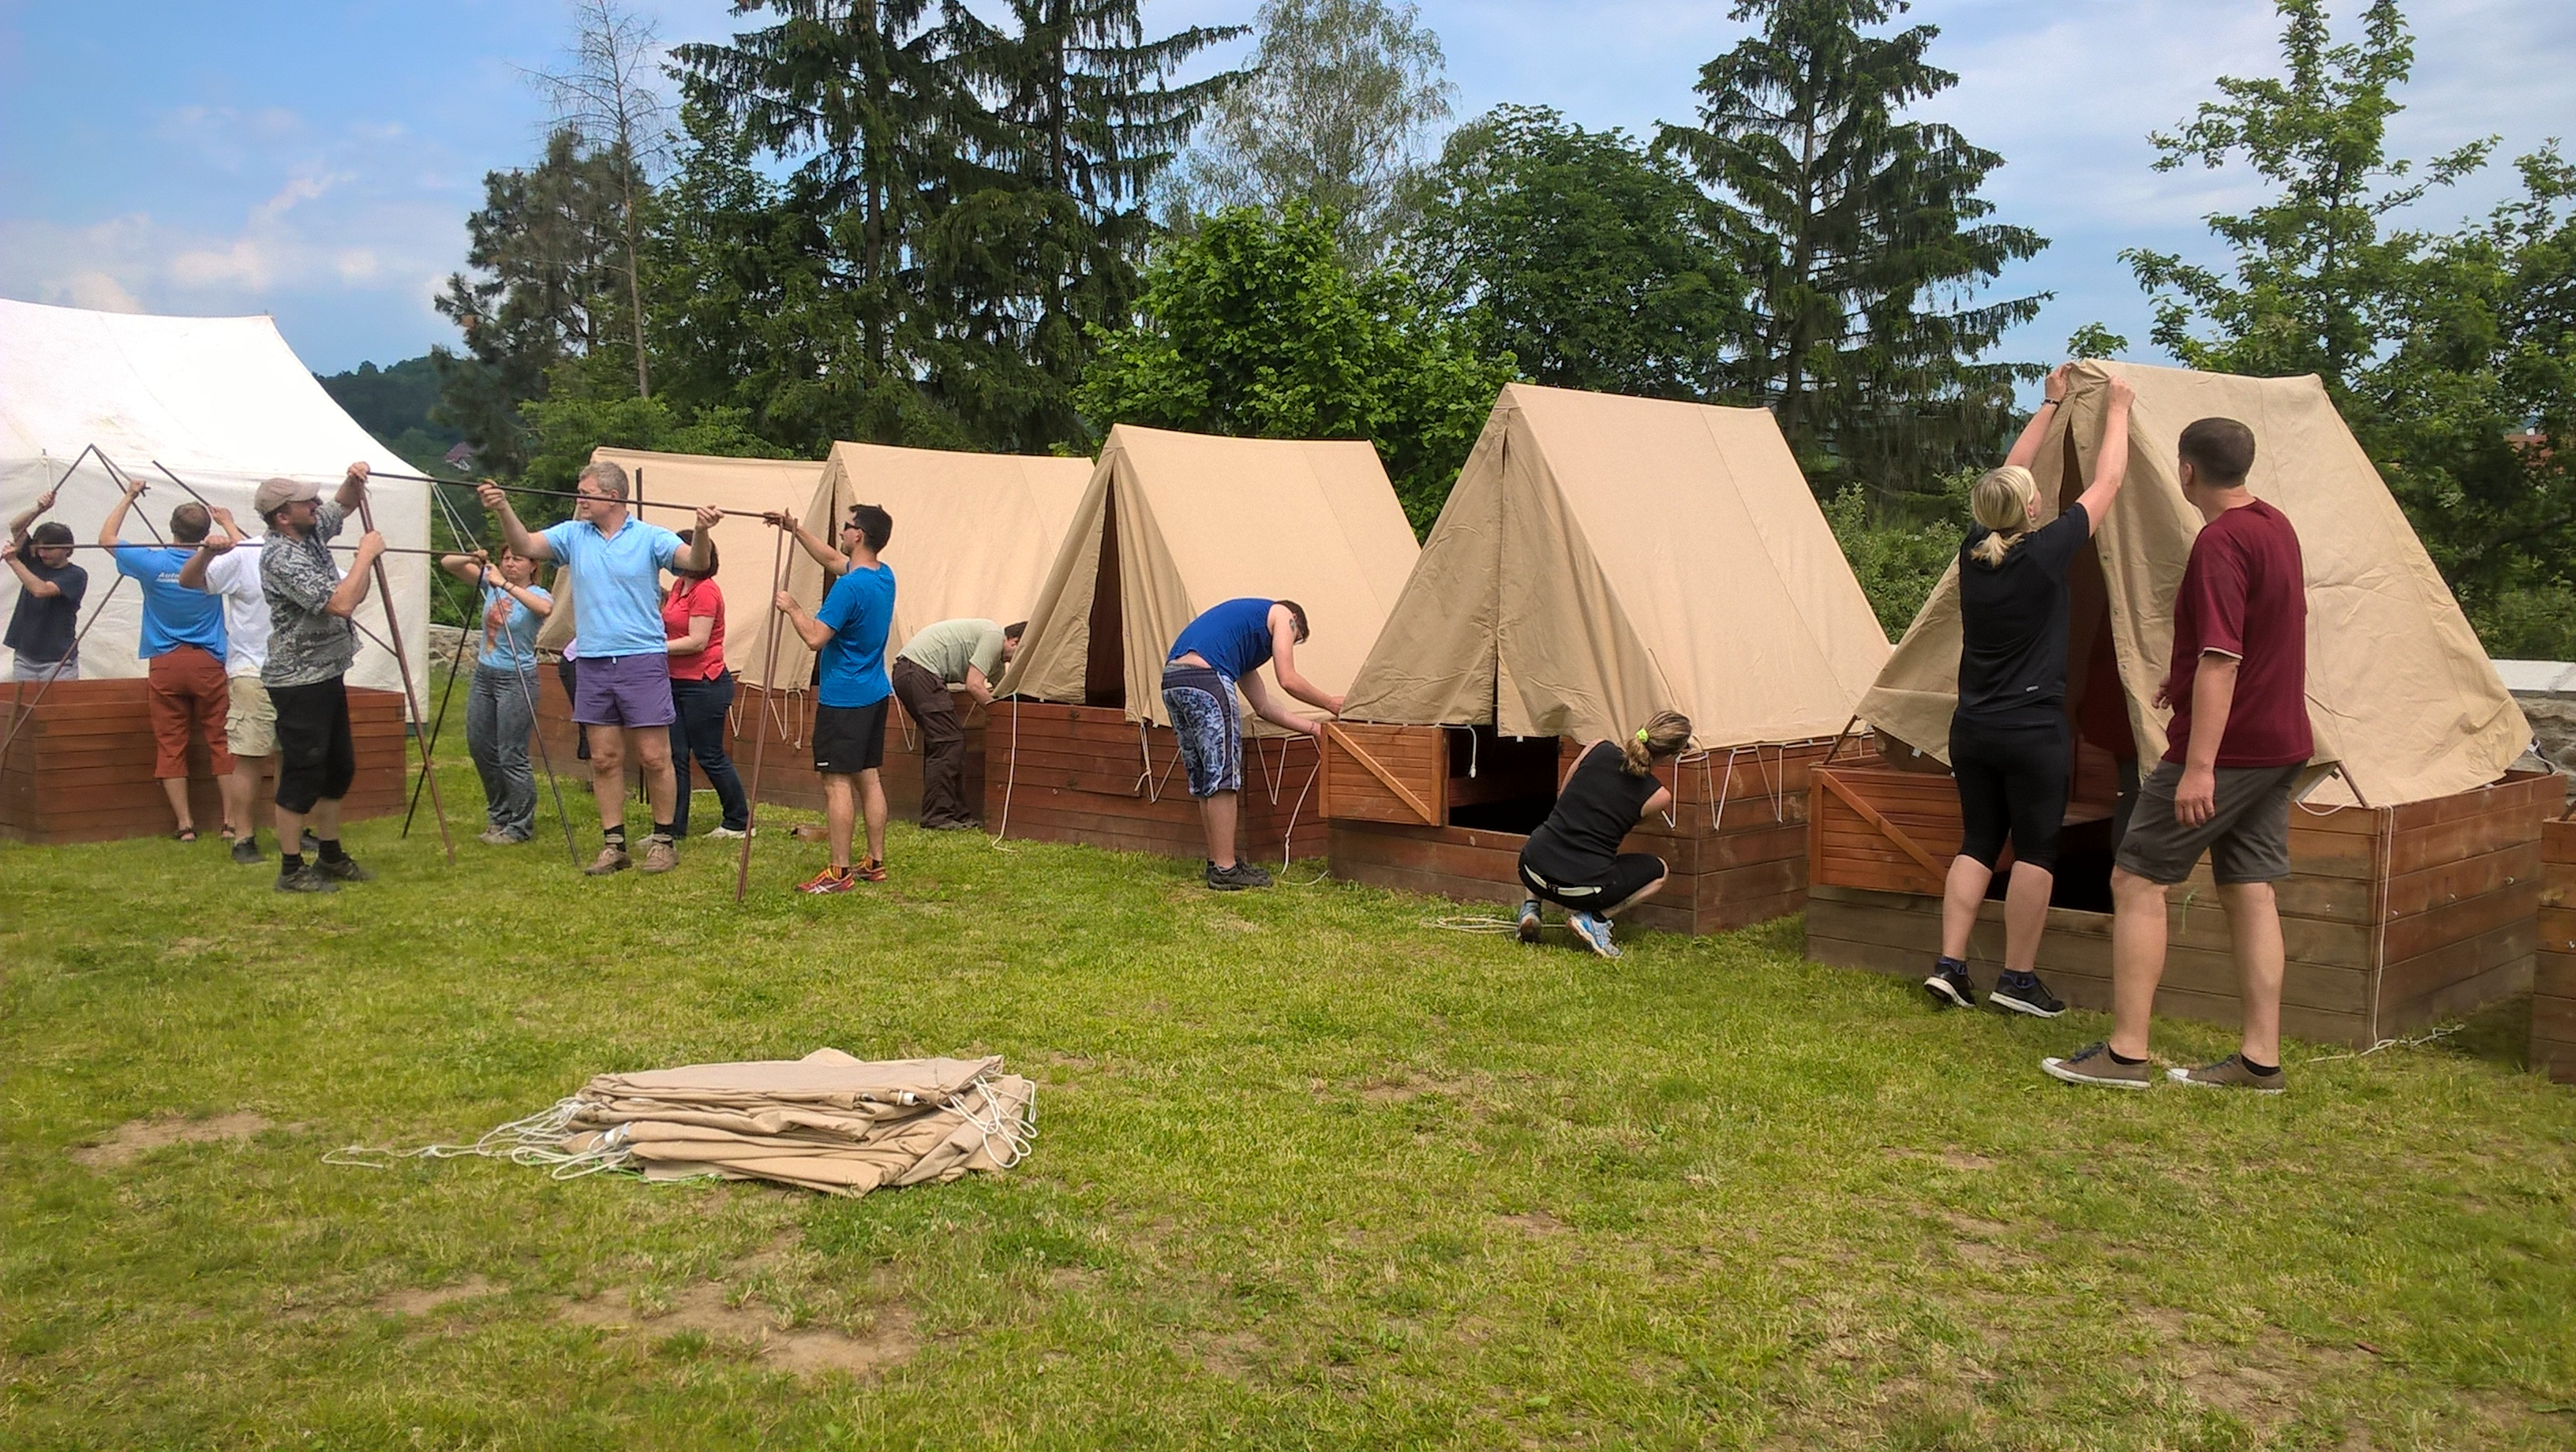 CSR_-_Czech_Republic_-Summer_camp_charity_Blansko.jpg